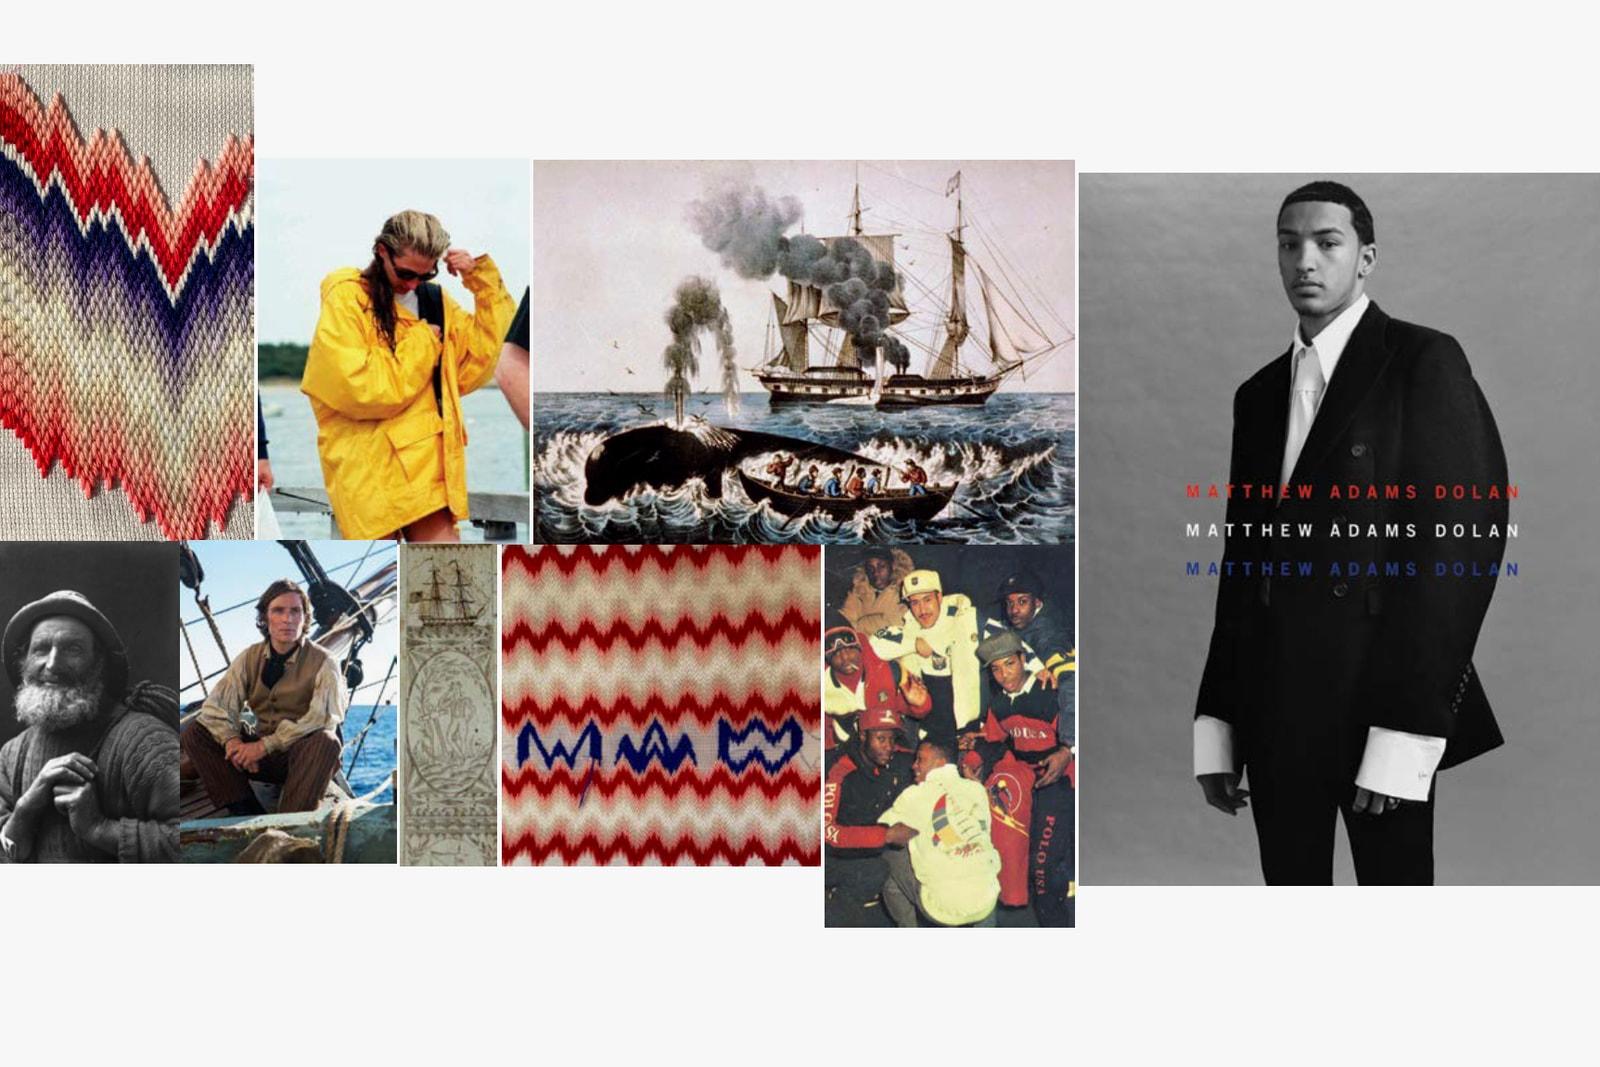 international woolmark prize emerging designers introduction ludovic de saint sernin botter matthew adams dolan richard malone samuel ross a-cold-wall bode emily gmbh blindness